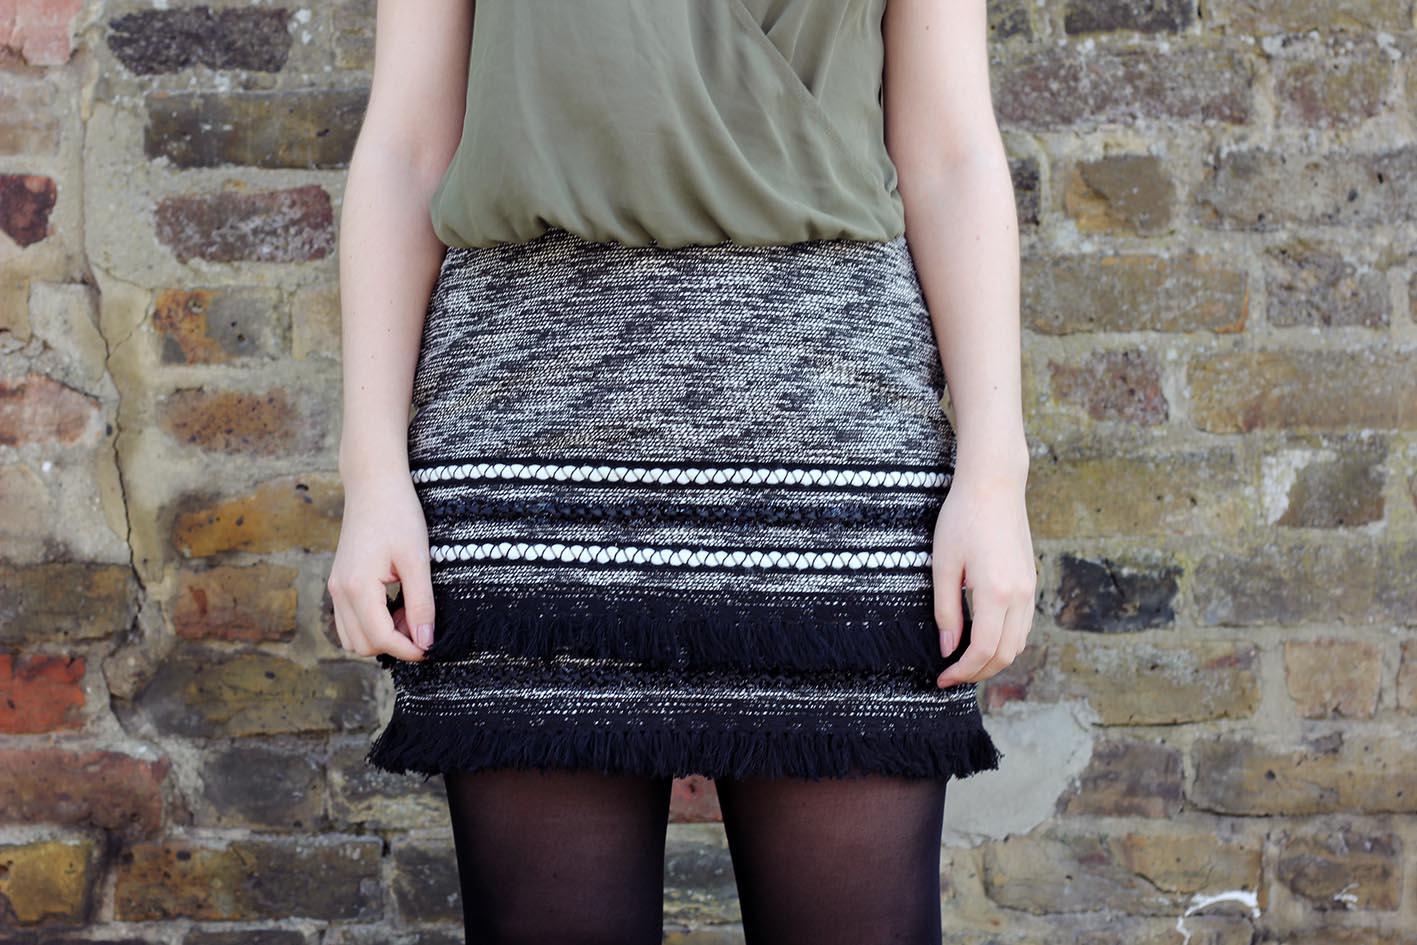 h&m skirts bloggers